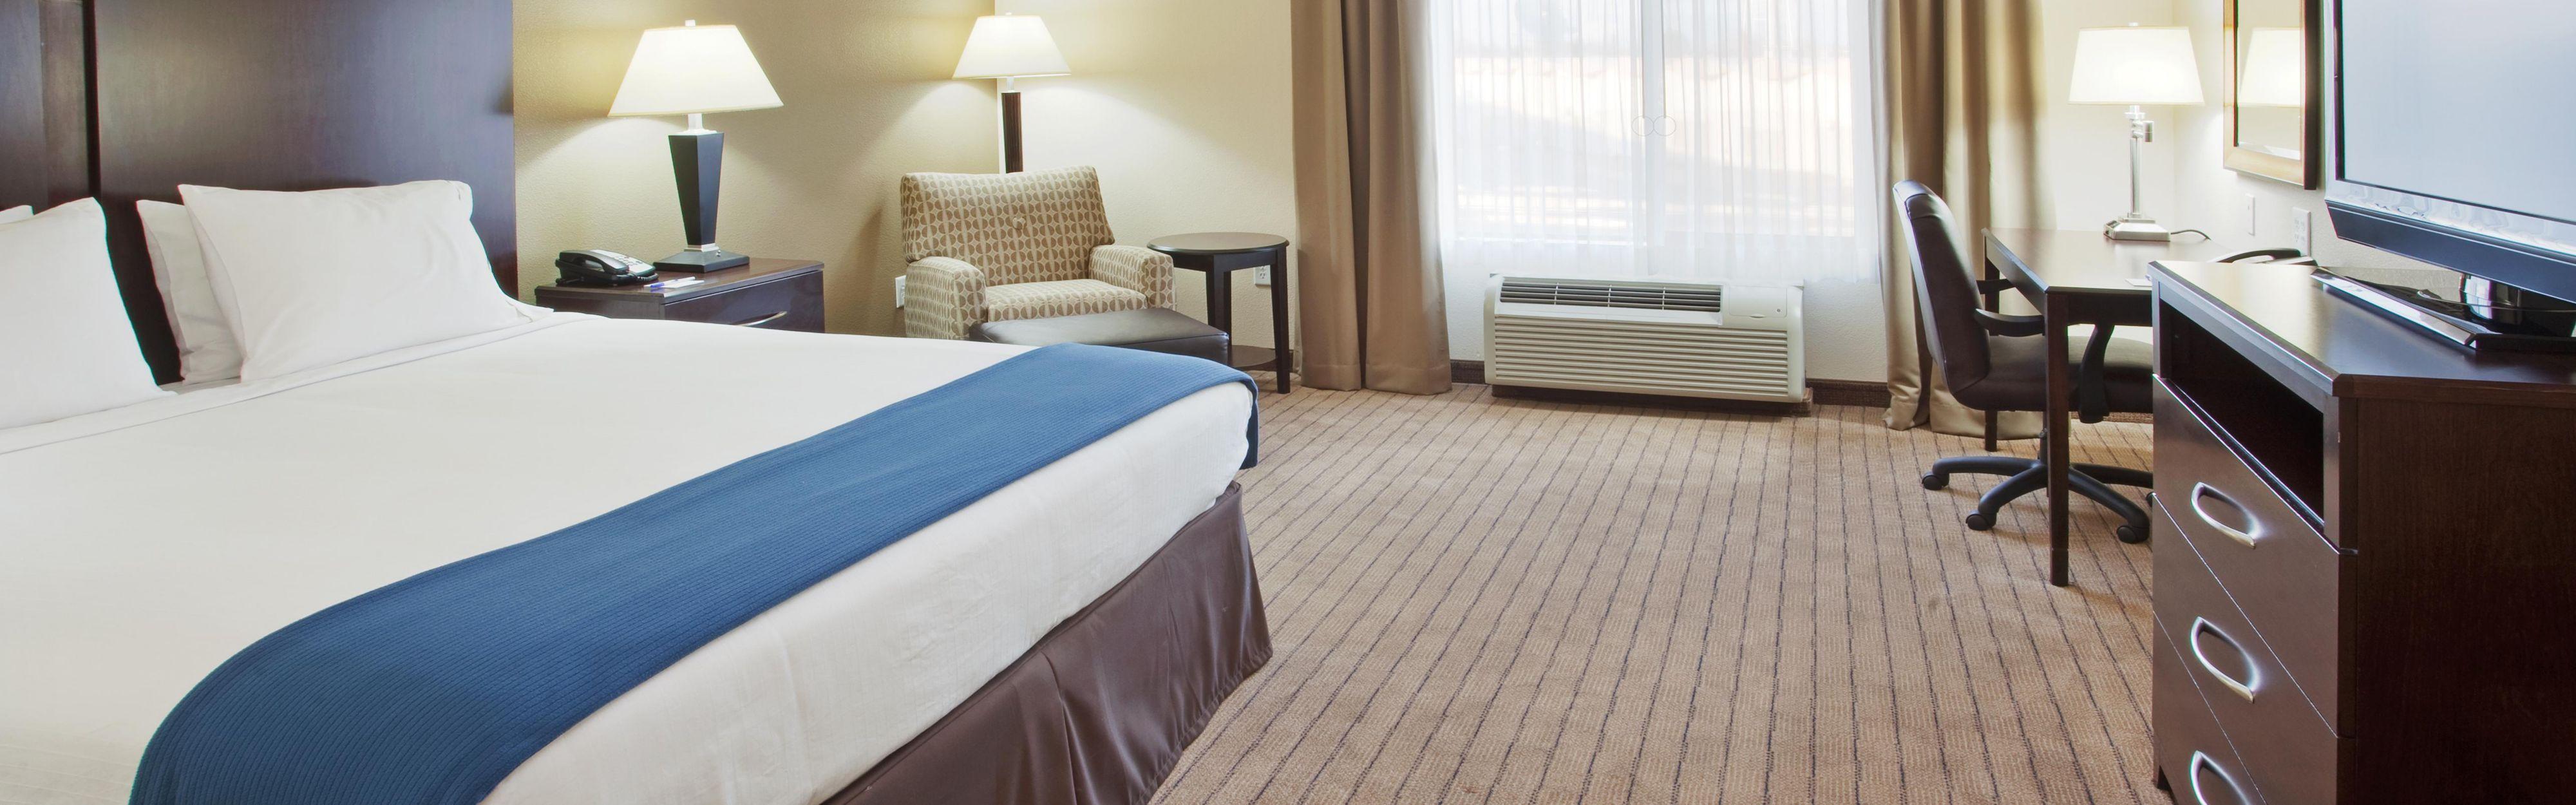 Holiday Inn Express & Suites Merced - Yosemite Natl Pk Area image 1